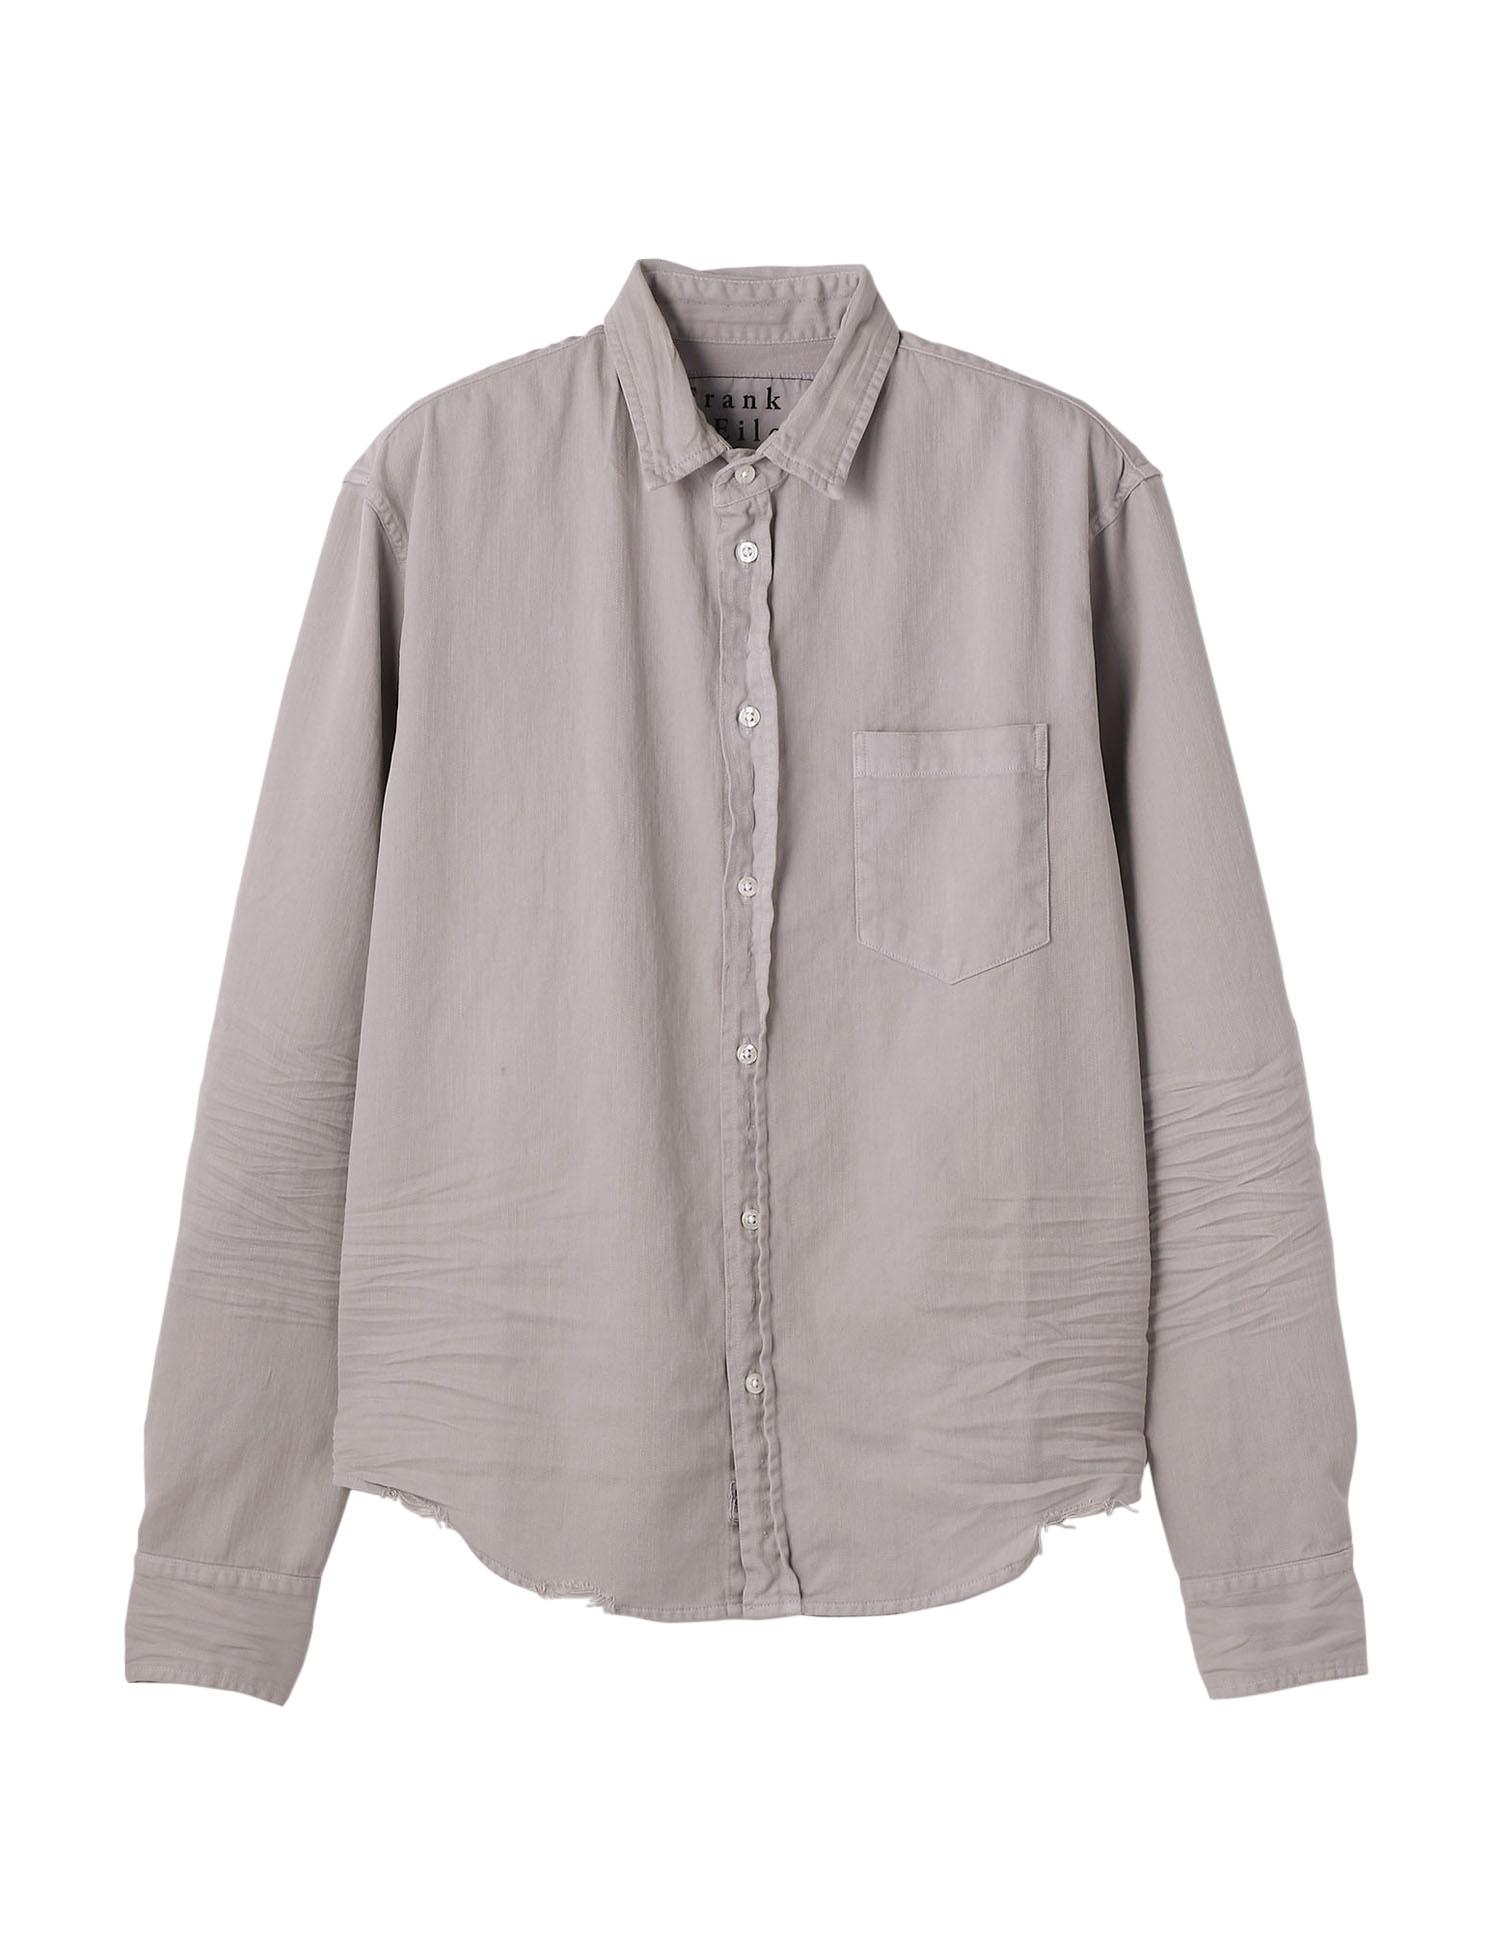 lt gray